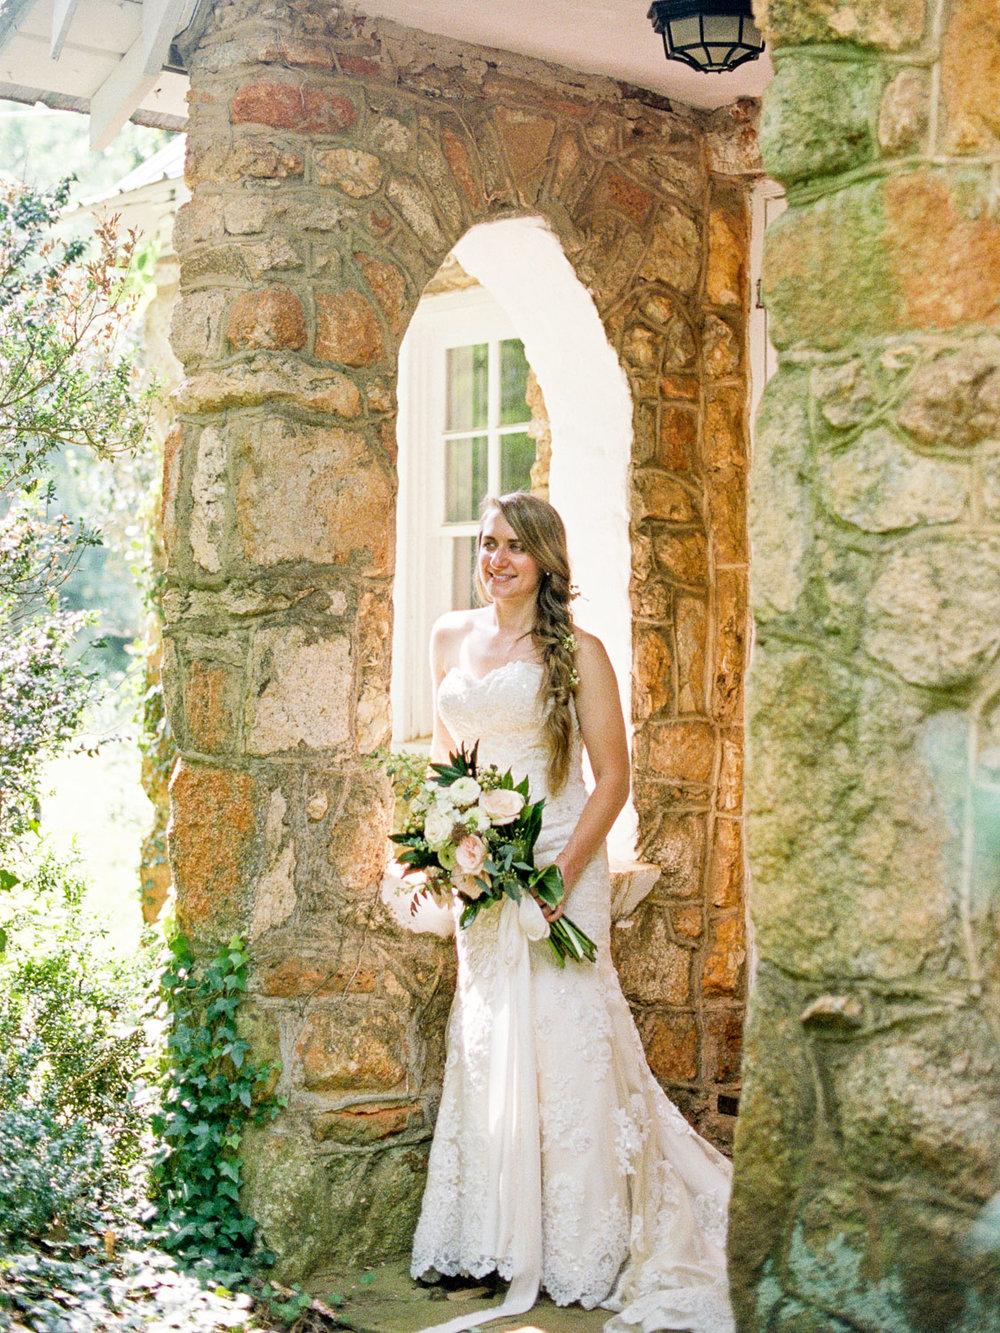 christinadavisphotography-romanticwedding-gardenweddinginspiration30.jpg